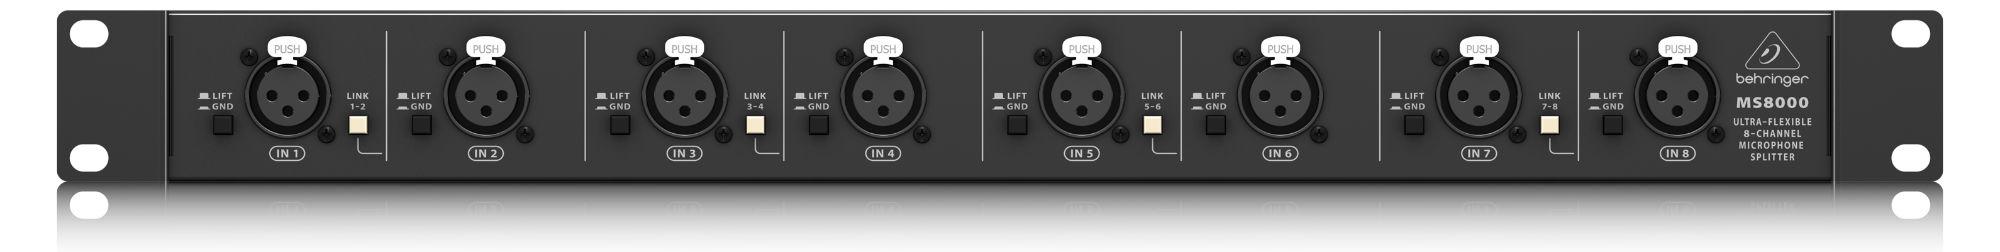 Diboxen - Behringer Ultralink MS8000 Mikrofon Splitter - Onlineshop Musikhaus Kirstein